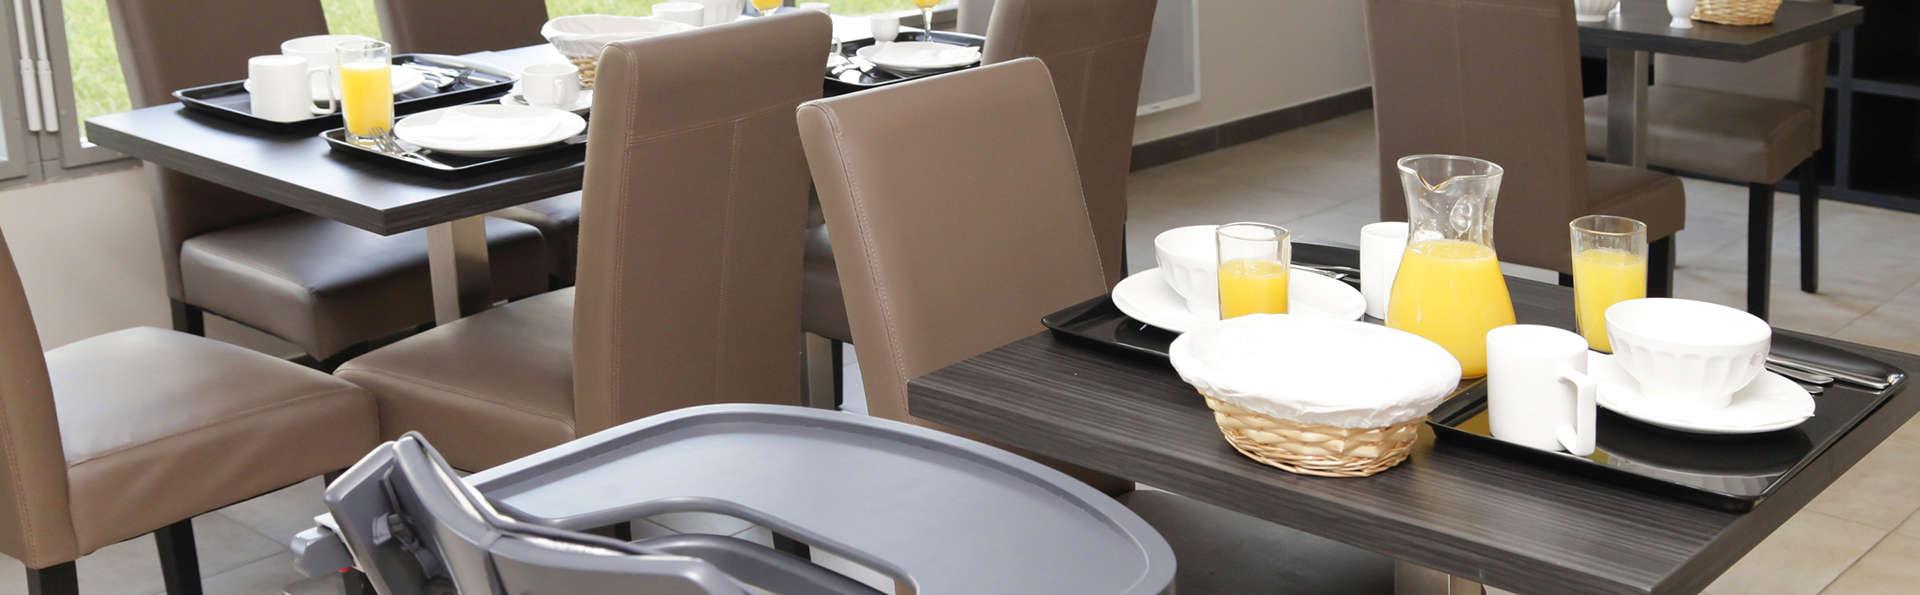 Appart'hôtel Odalys Blamont - Edit_Restaurant.jpg